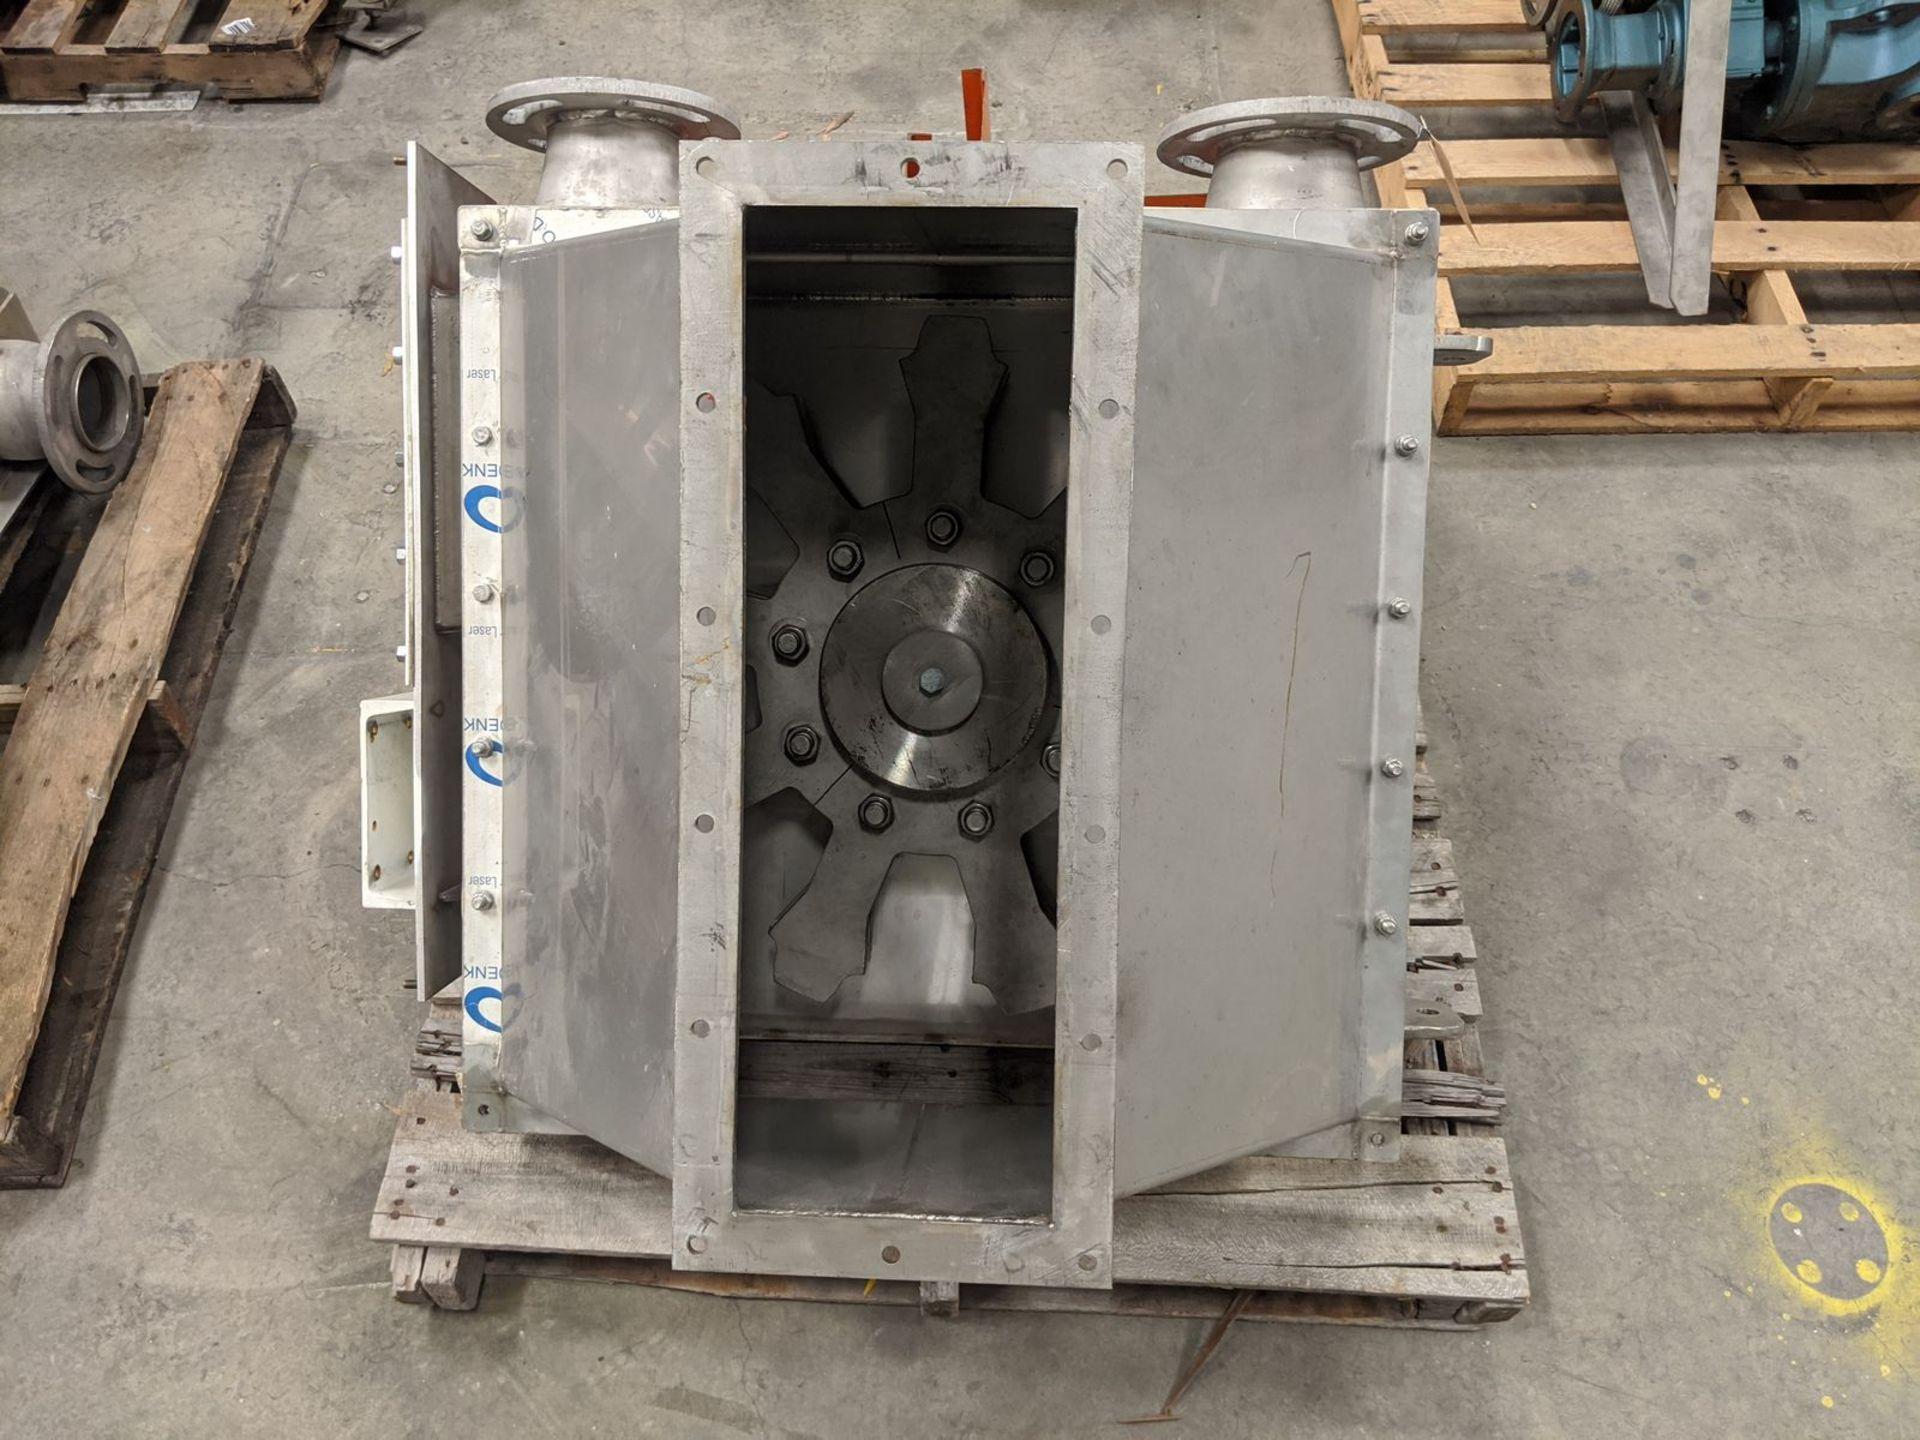 "Hapman 4"" Tube (Drag) Conveyor Hopper Gear Section - Image 2 of 3"